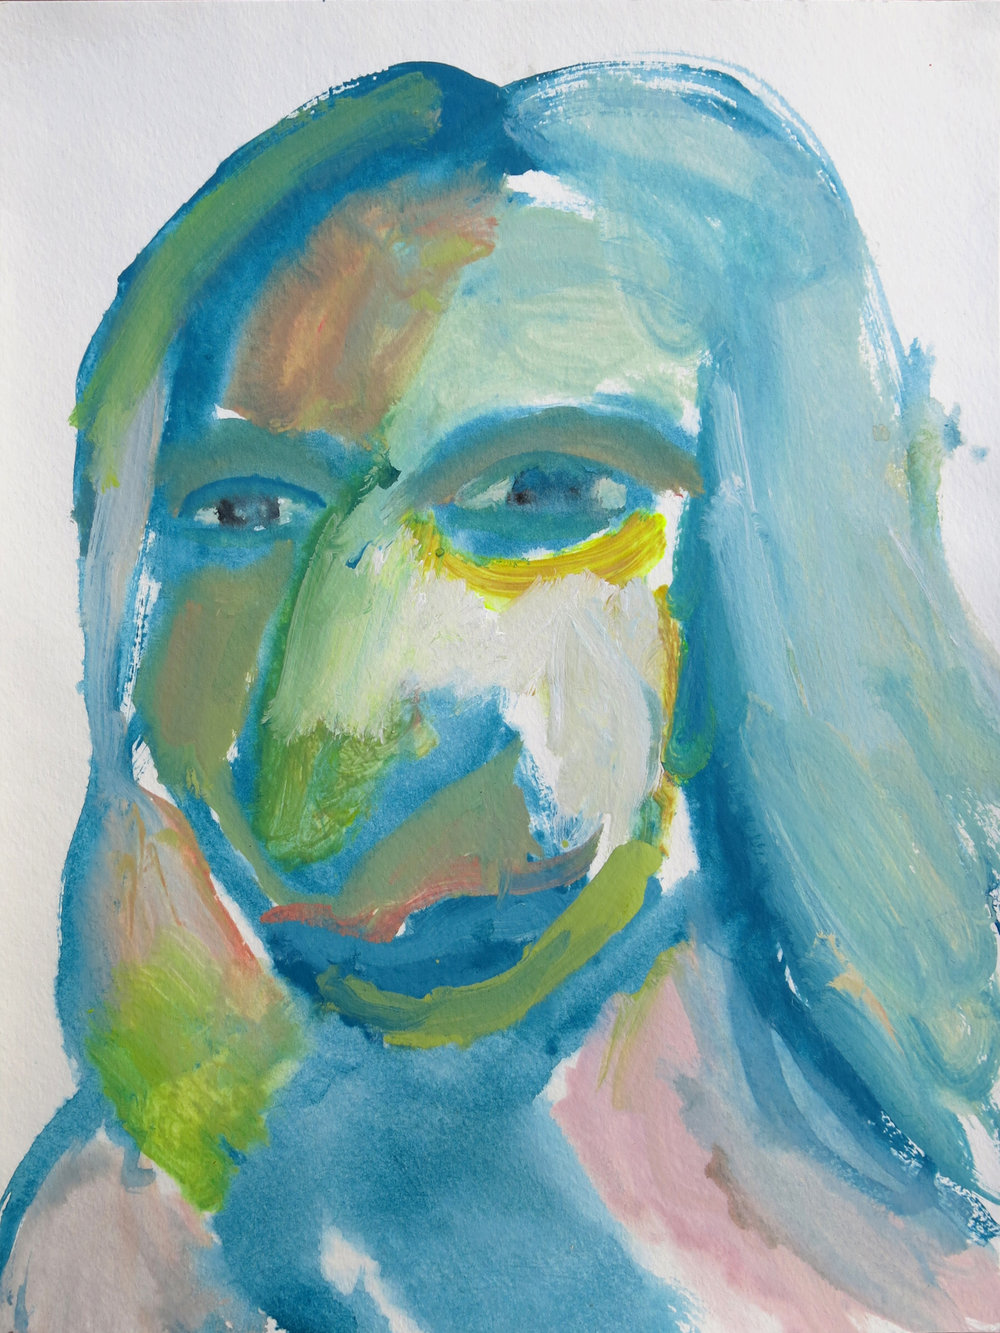 Barbra Streisand Portrait #85